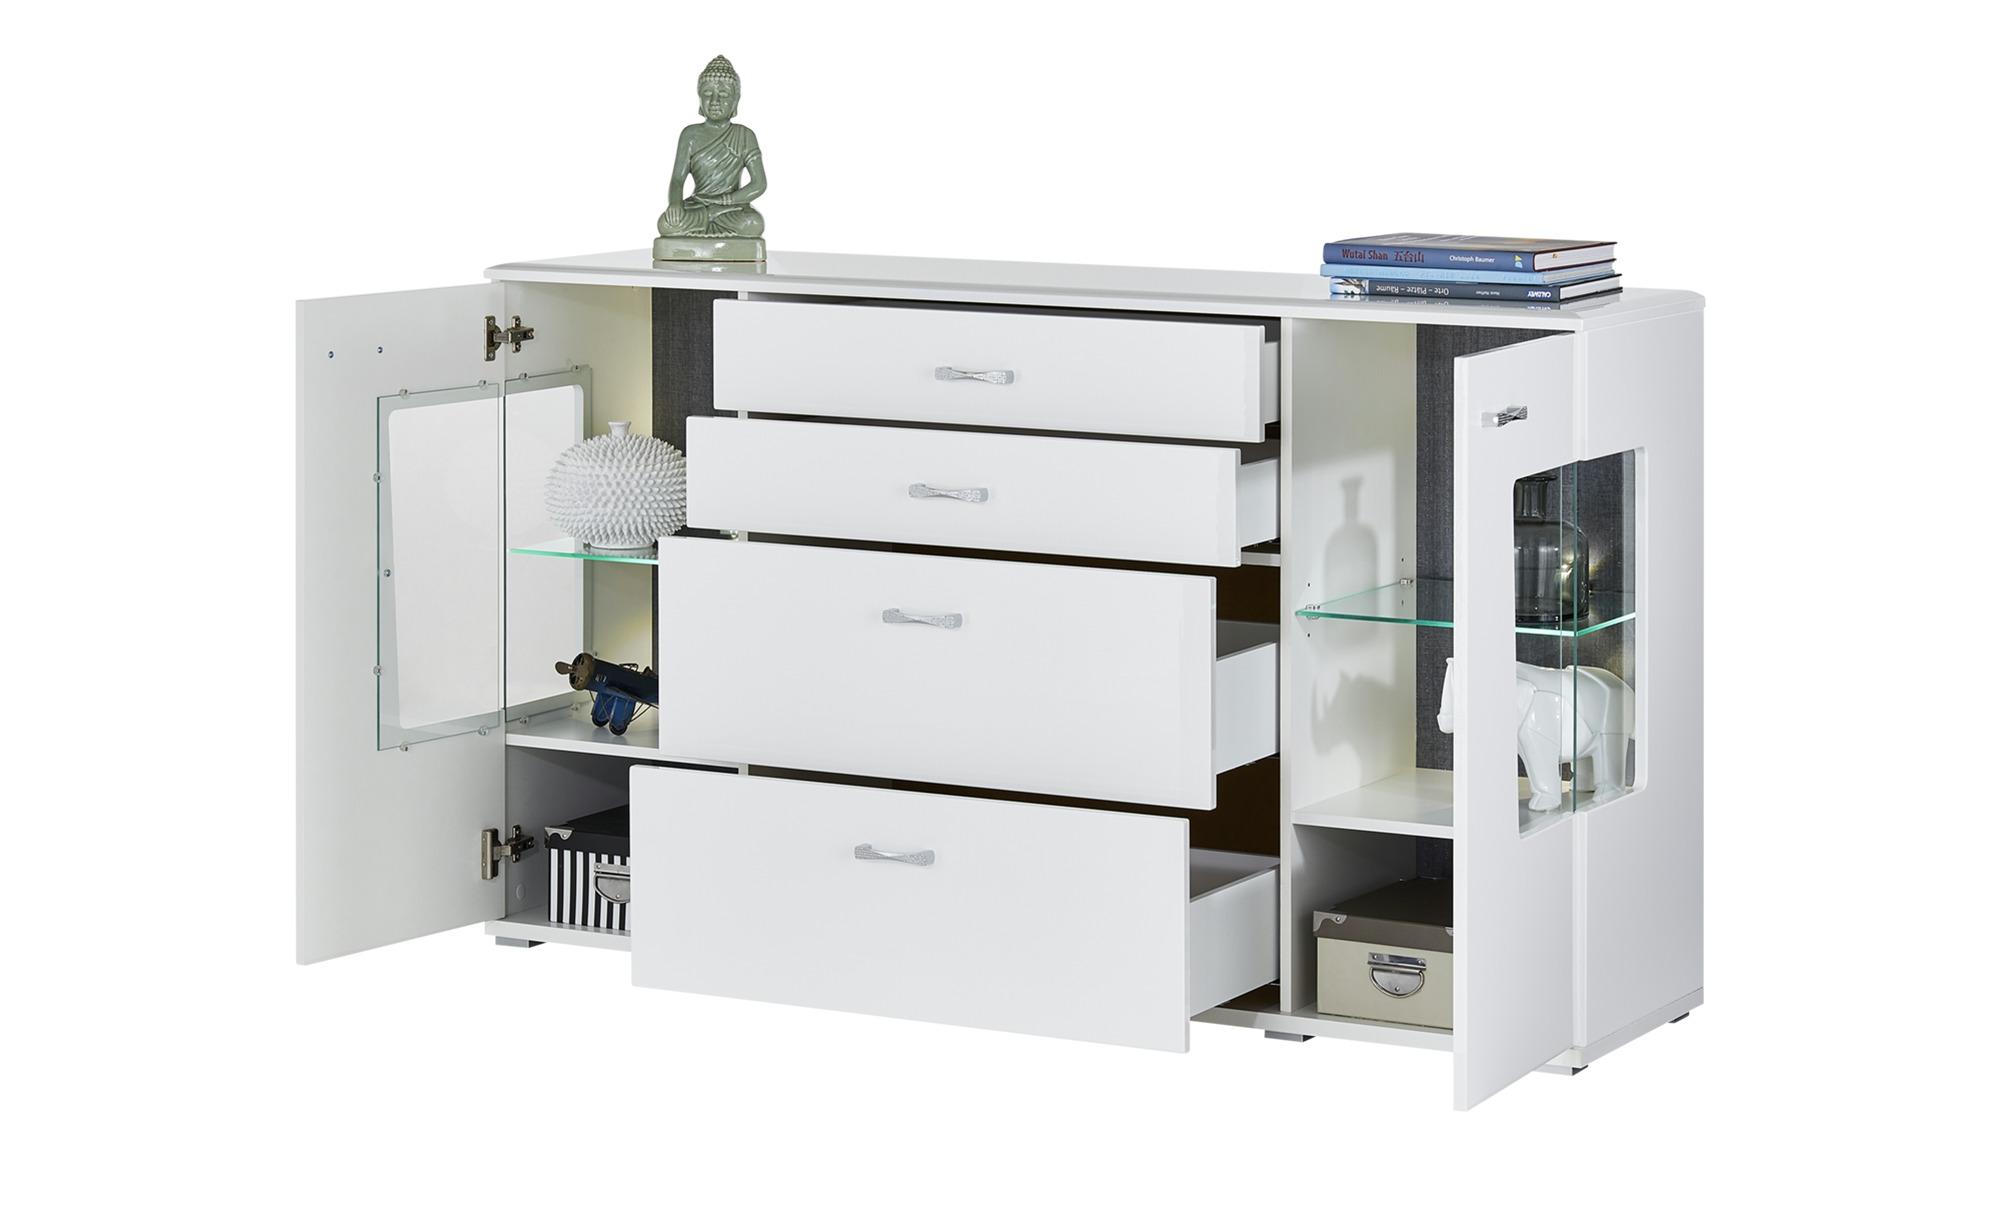 uno Sideboard  Alibaba ¦ Maße (cm): B: 160 H: 93 T: 42 Kommoden & Sideboards > Sideboards - Höffner